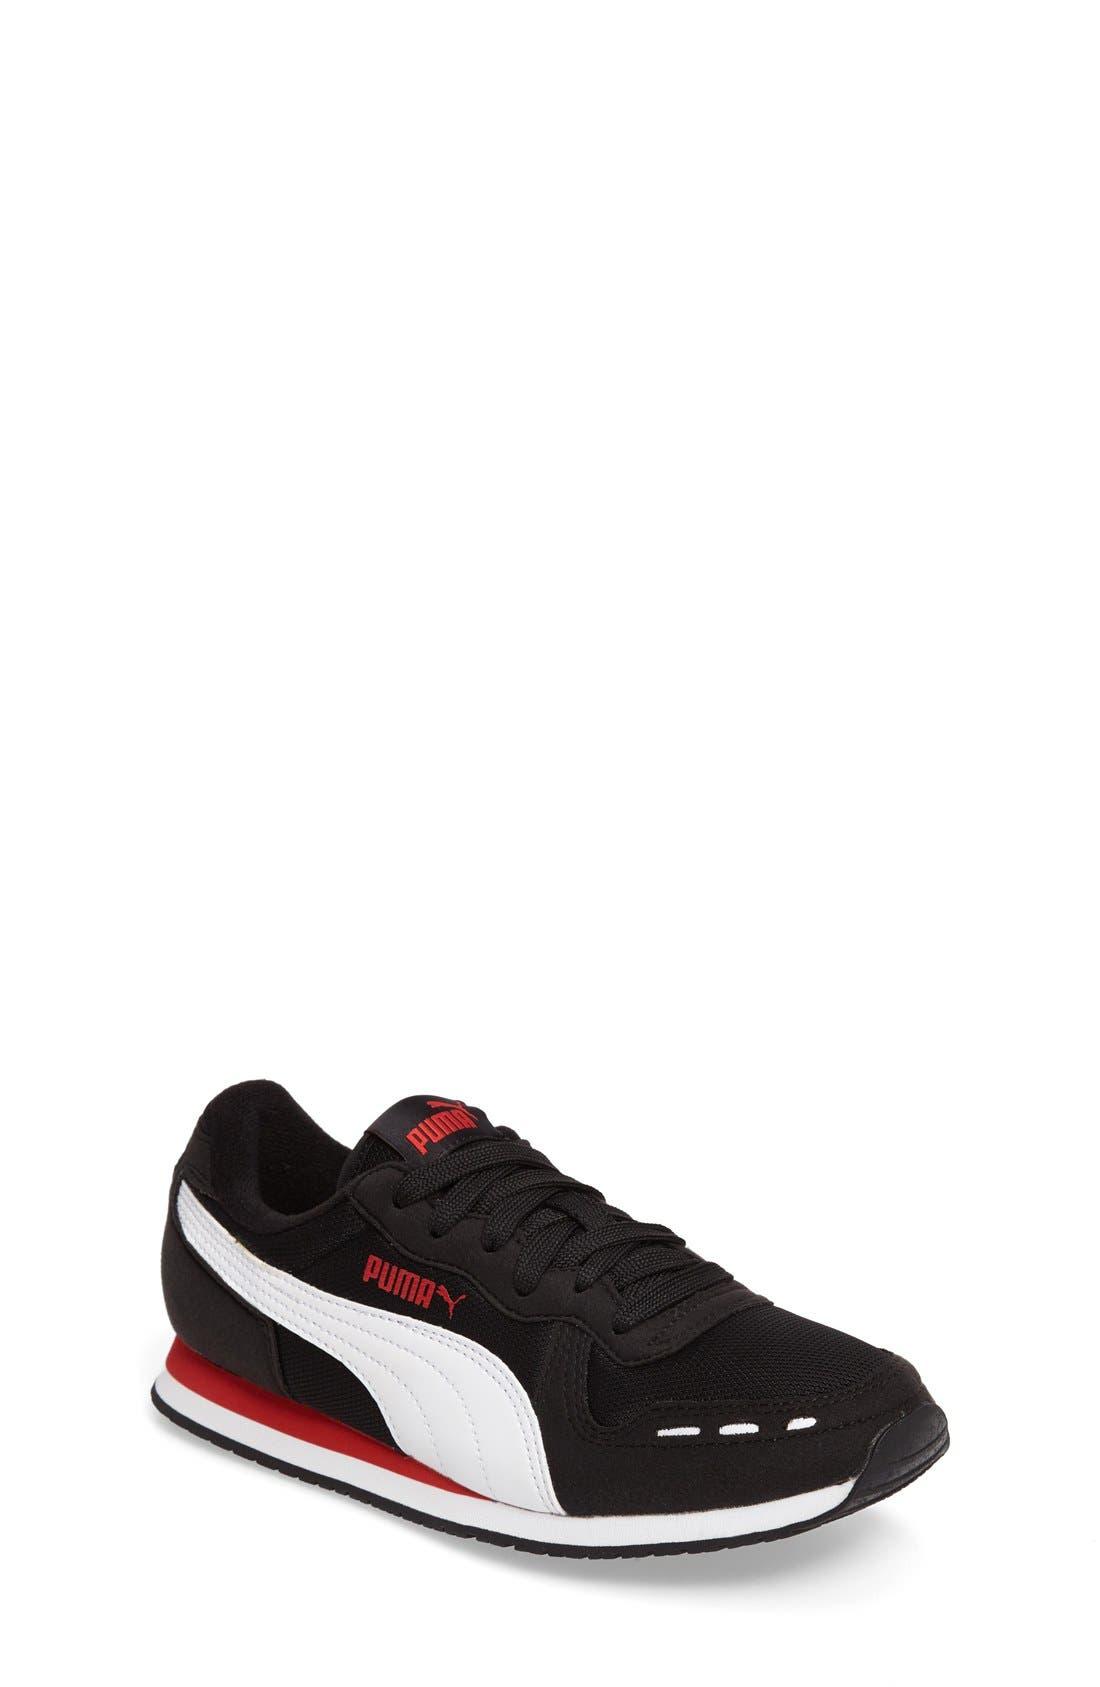 Cabana Racer Sneaker,                             Main thumbnail 1, color,                             Puma Black-Puma White